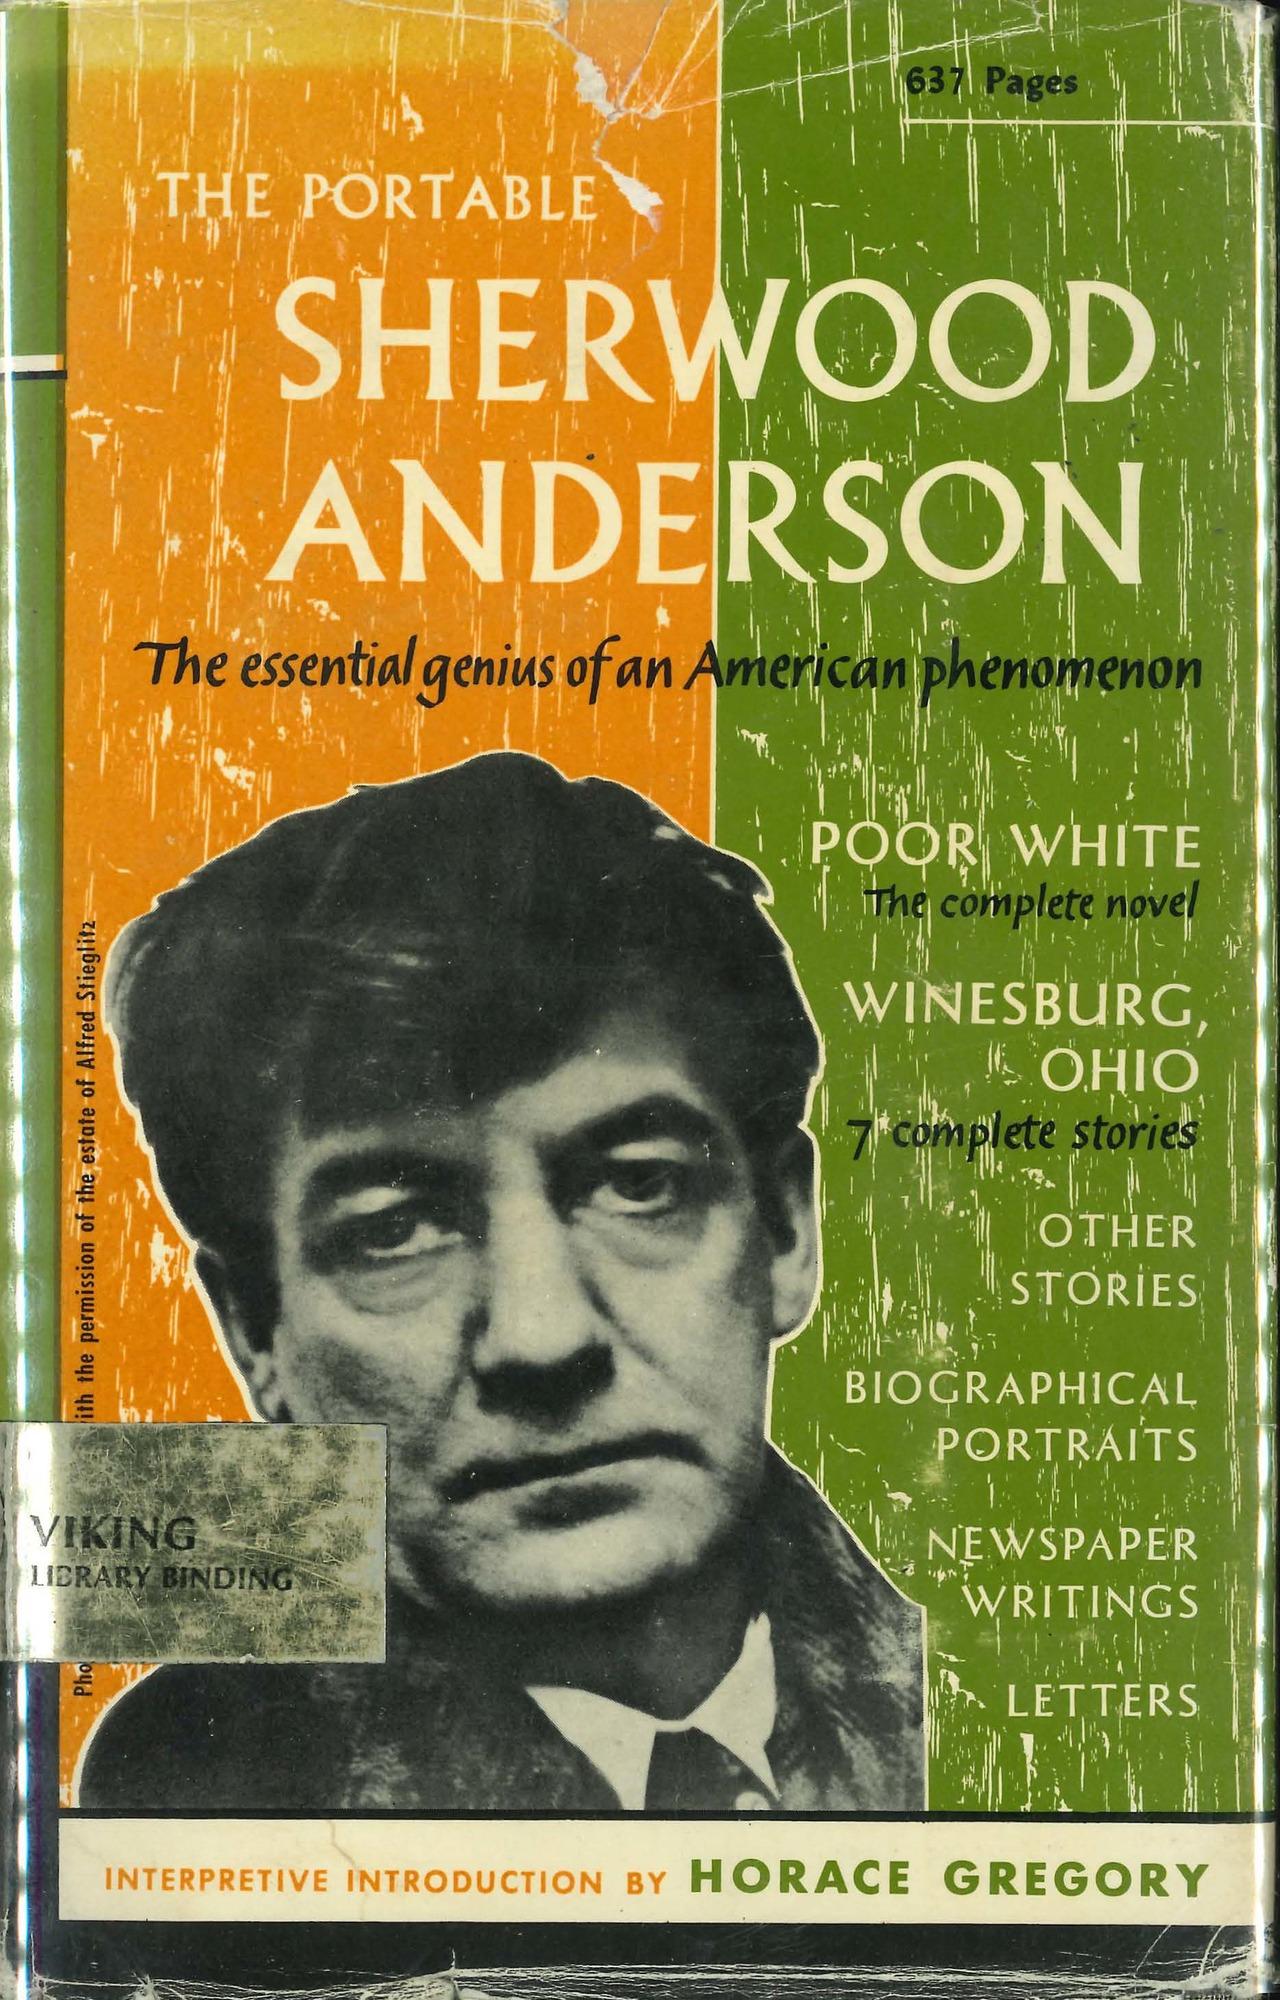 PortableSherwoodAnderson_1949.jpg